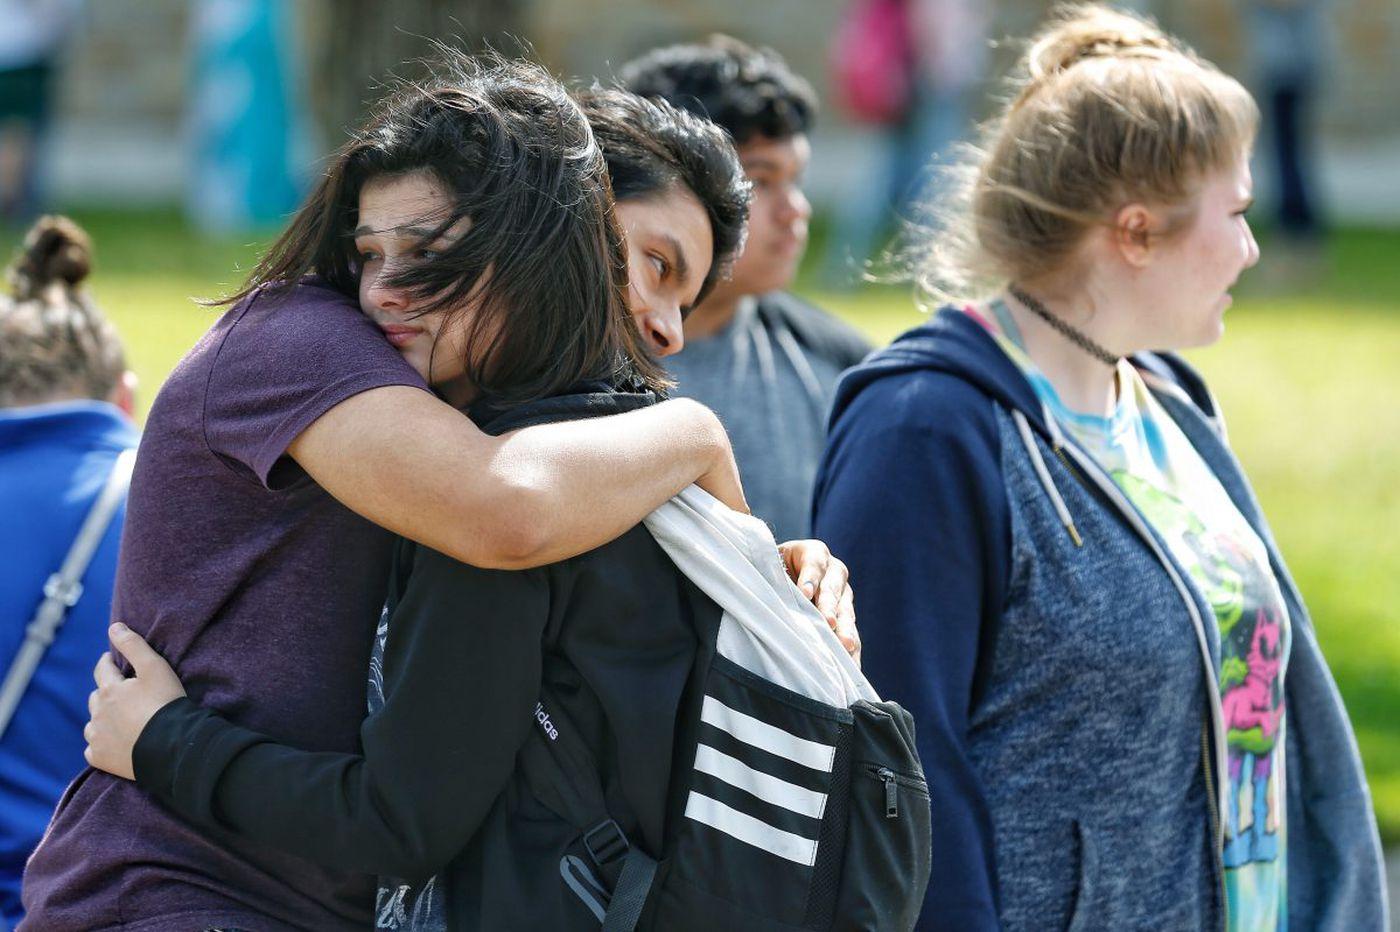 Study: 2018 worst year for gun incidents in schools